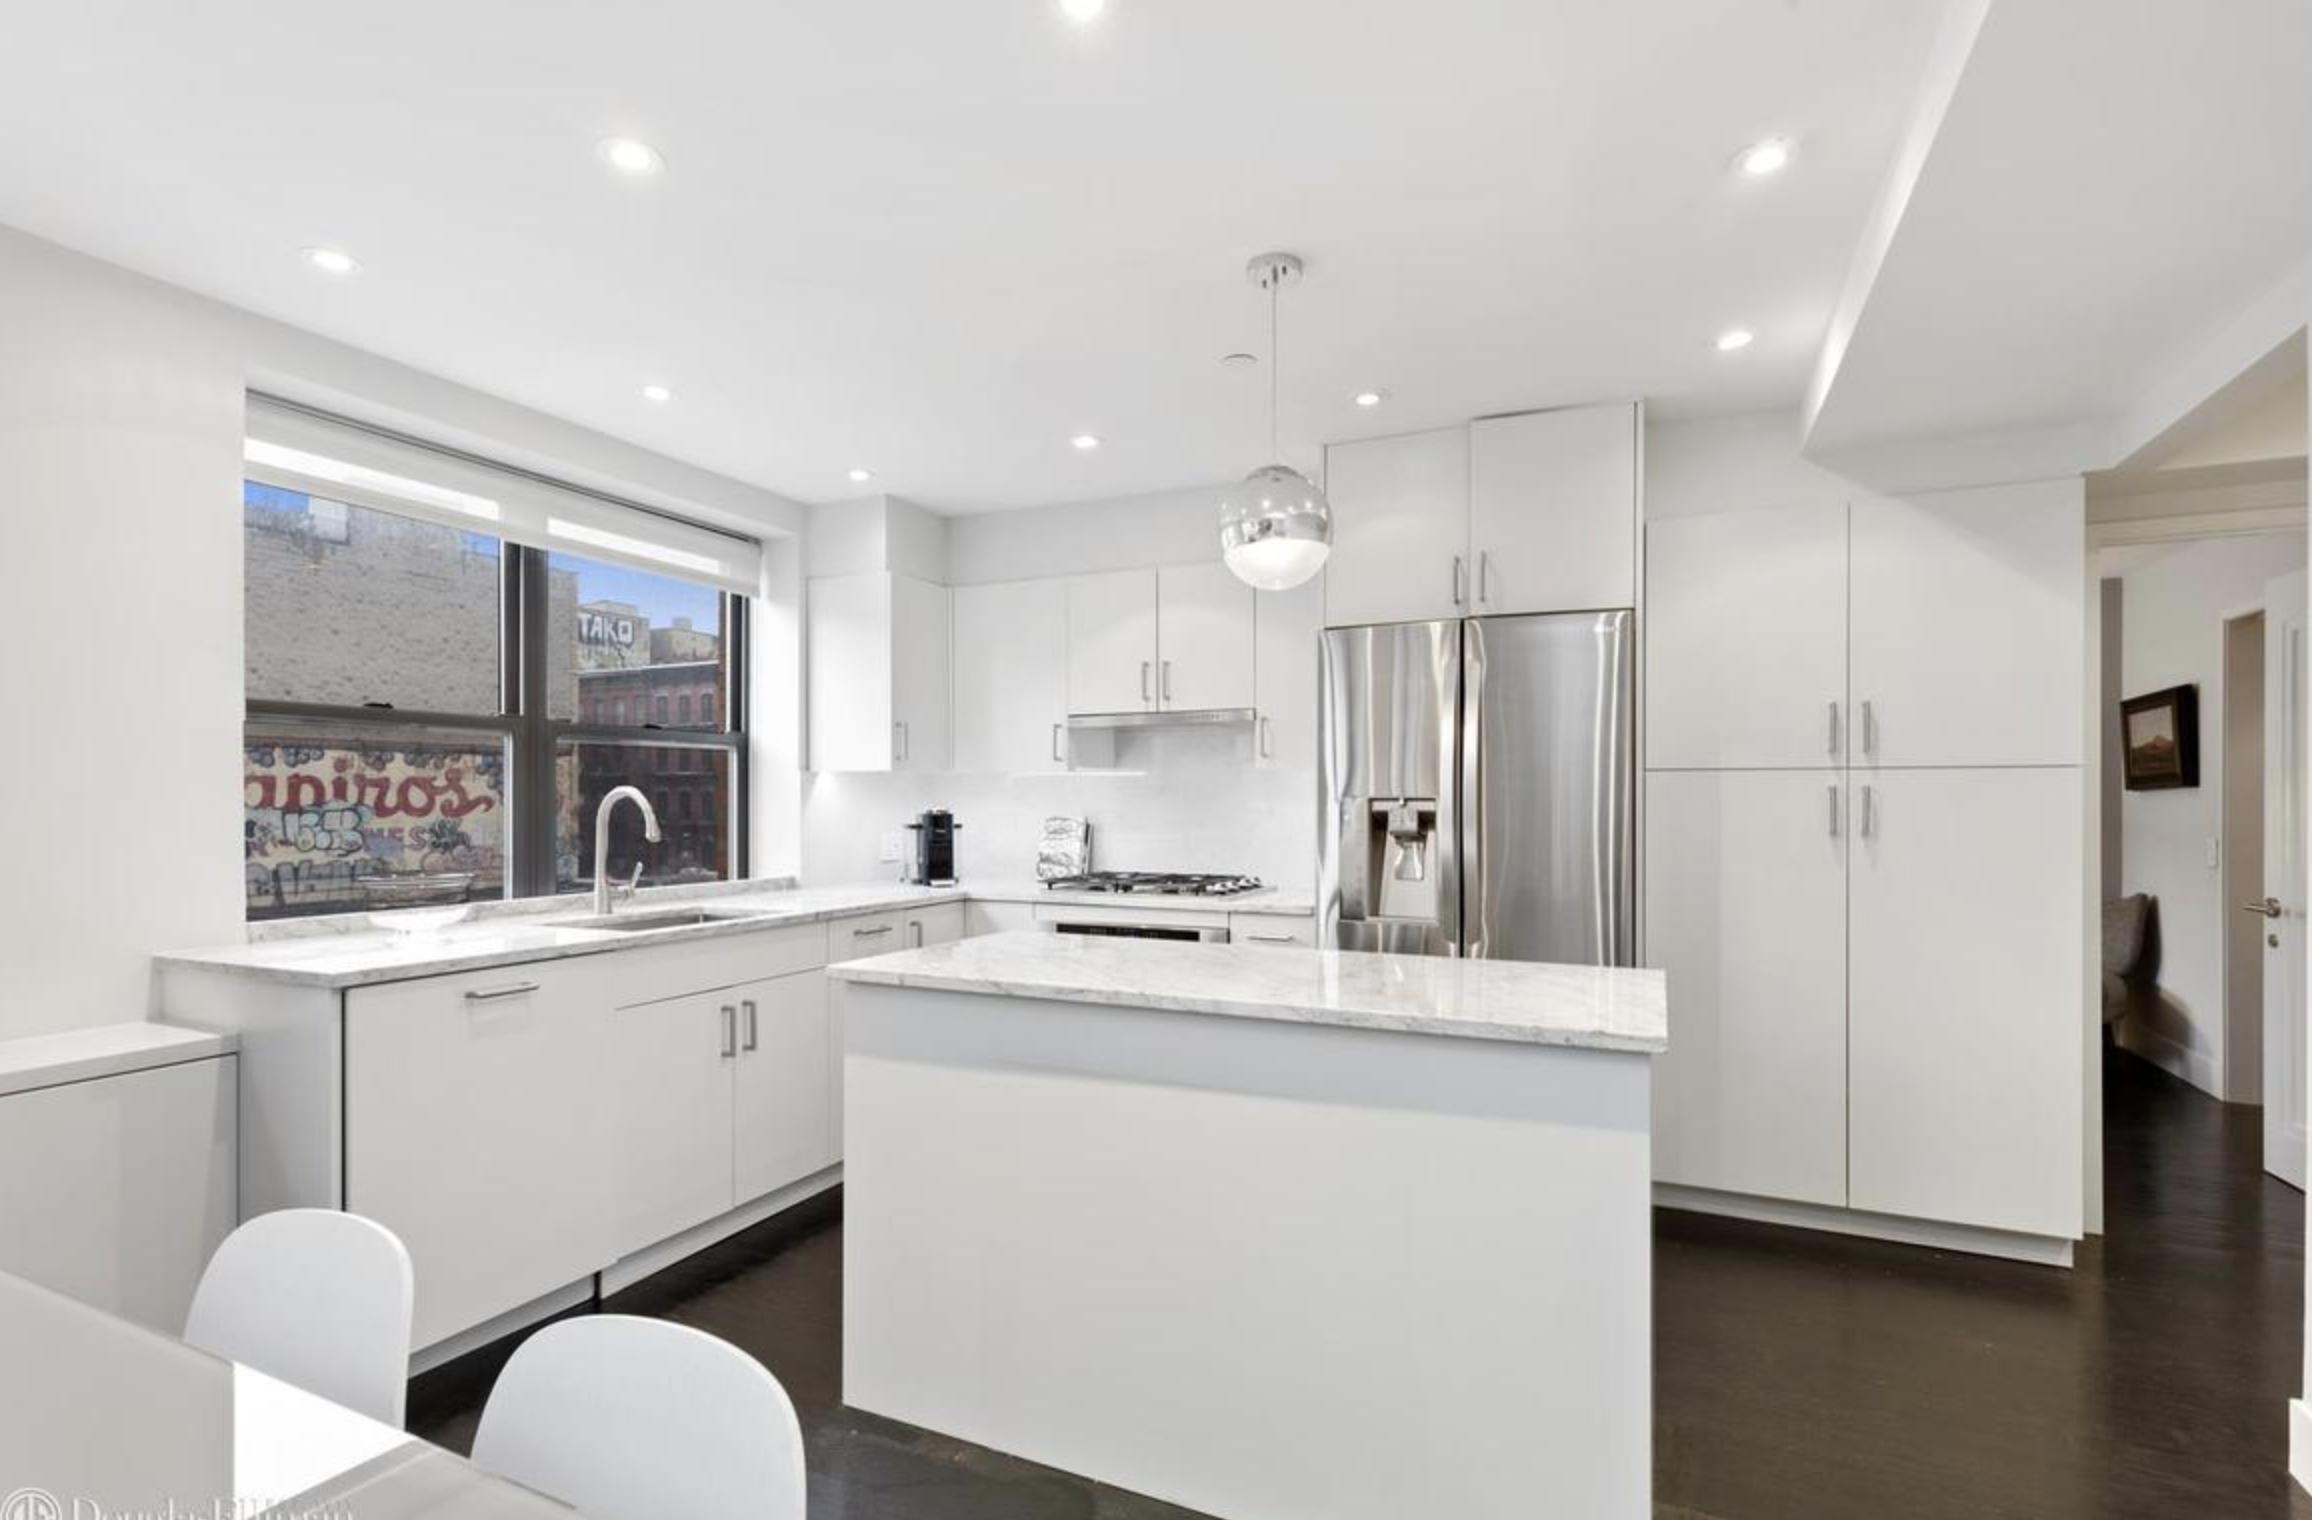 133 Essex St, #301 - Lower East Side | Manhattan    1 Bedroom // 1 Bath Days on Market — 57 Sold Price:    $1,290,000